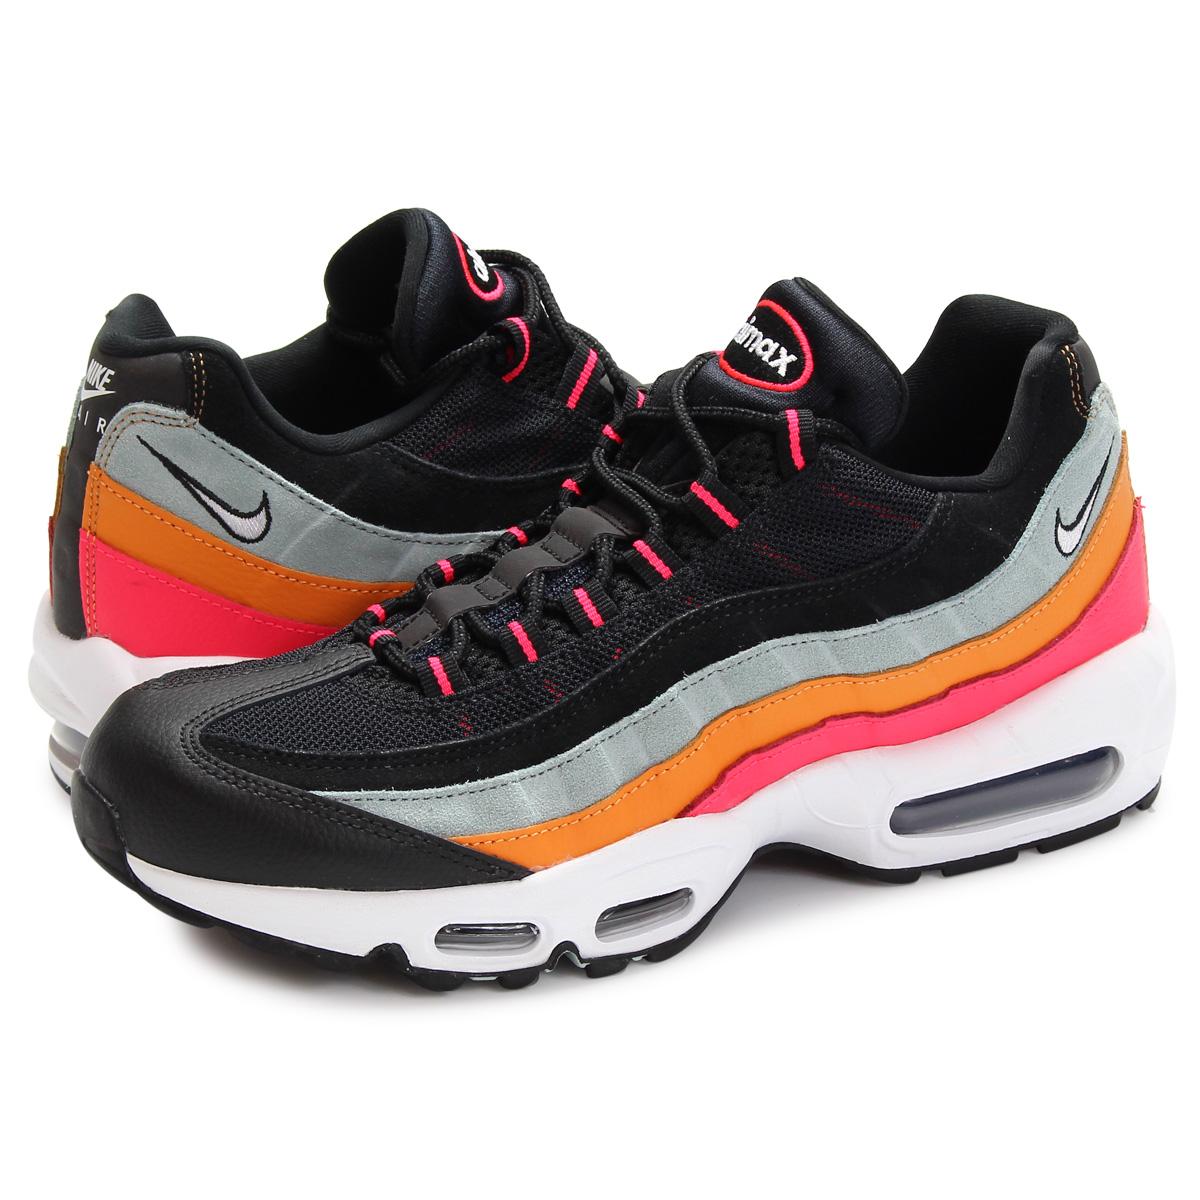 Nike Air Max 95 Essential Trainers AT9865 002 | Black